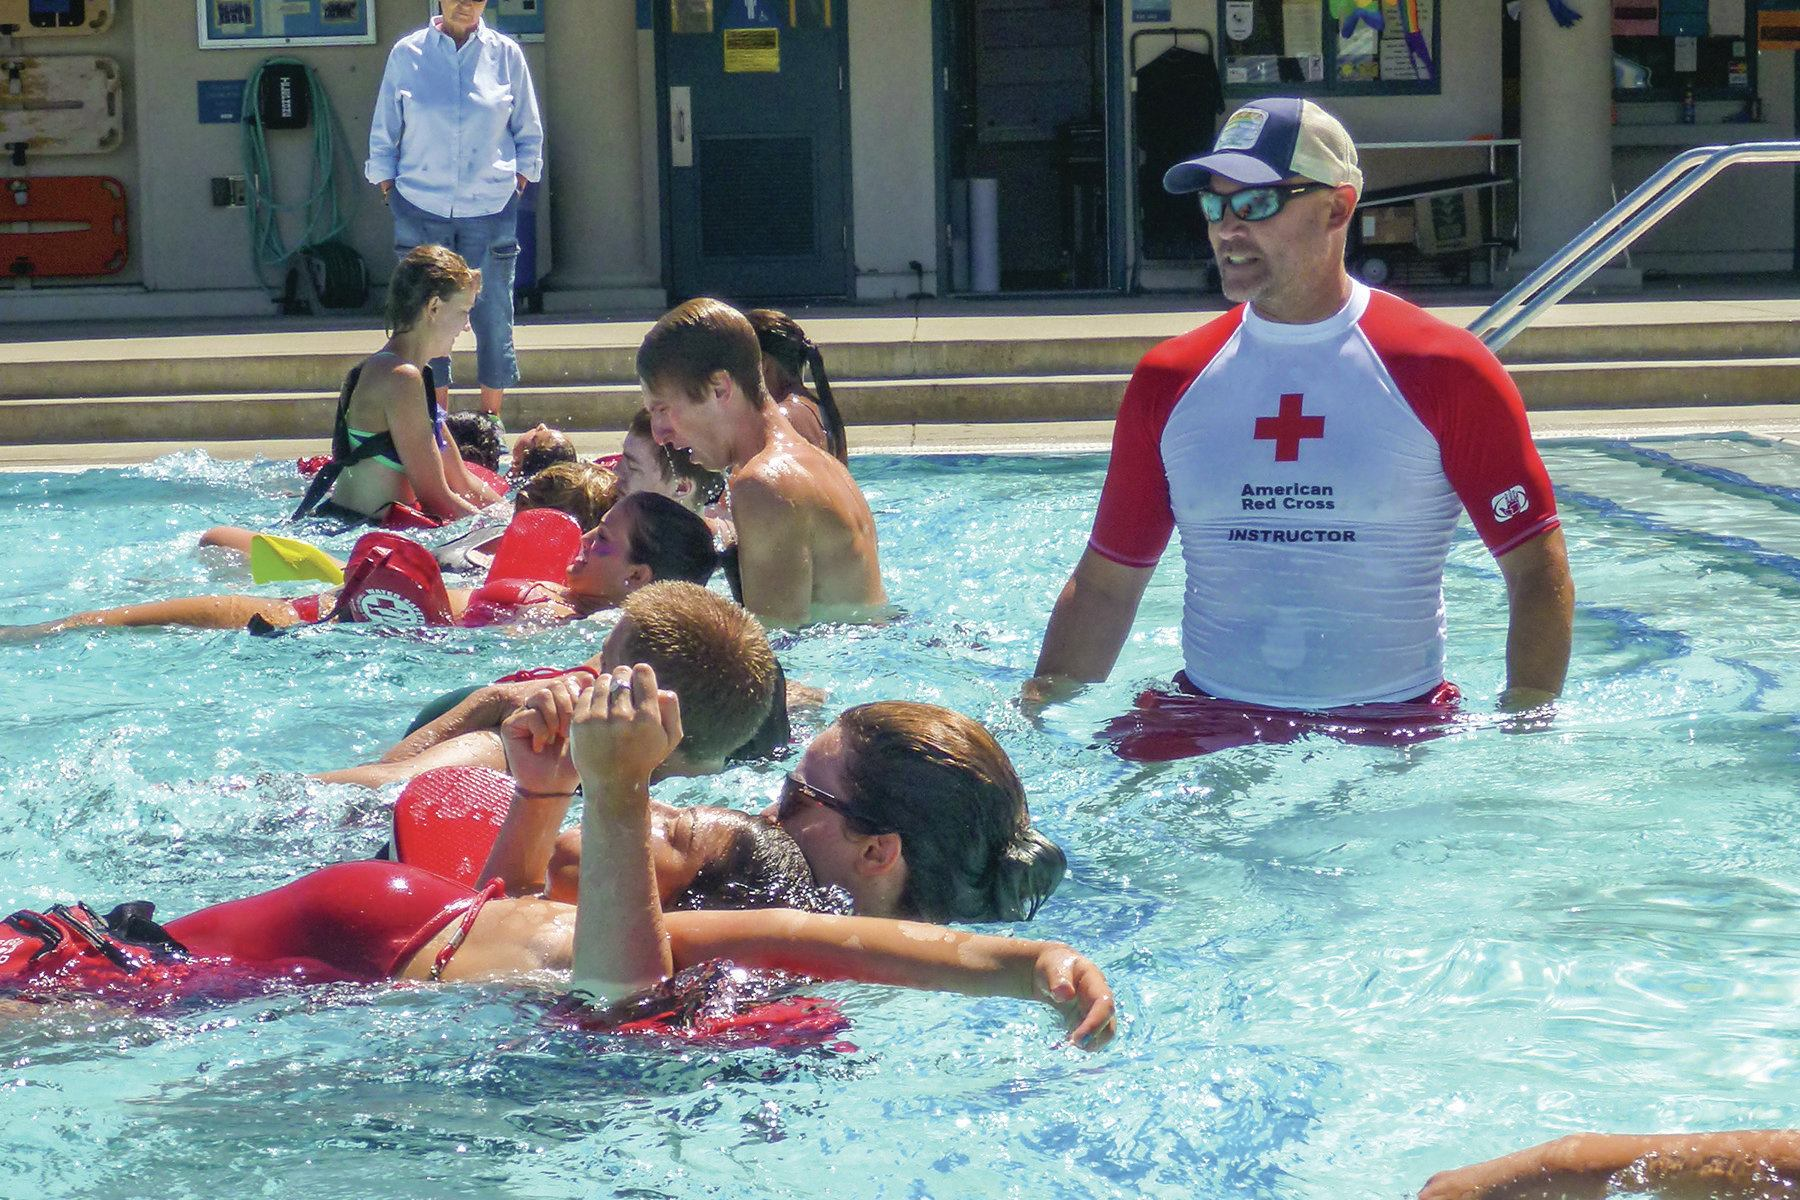 building better scenarios for lifeguard training